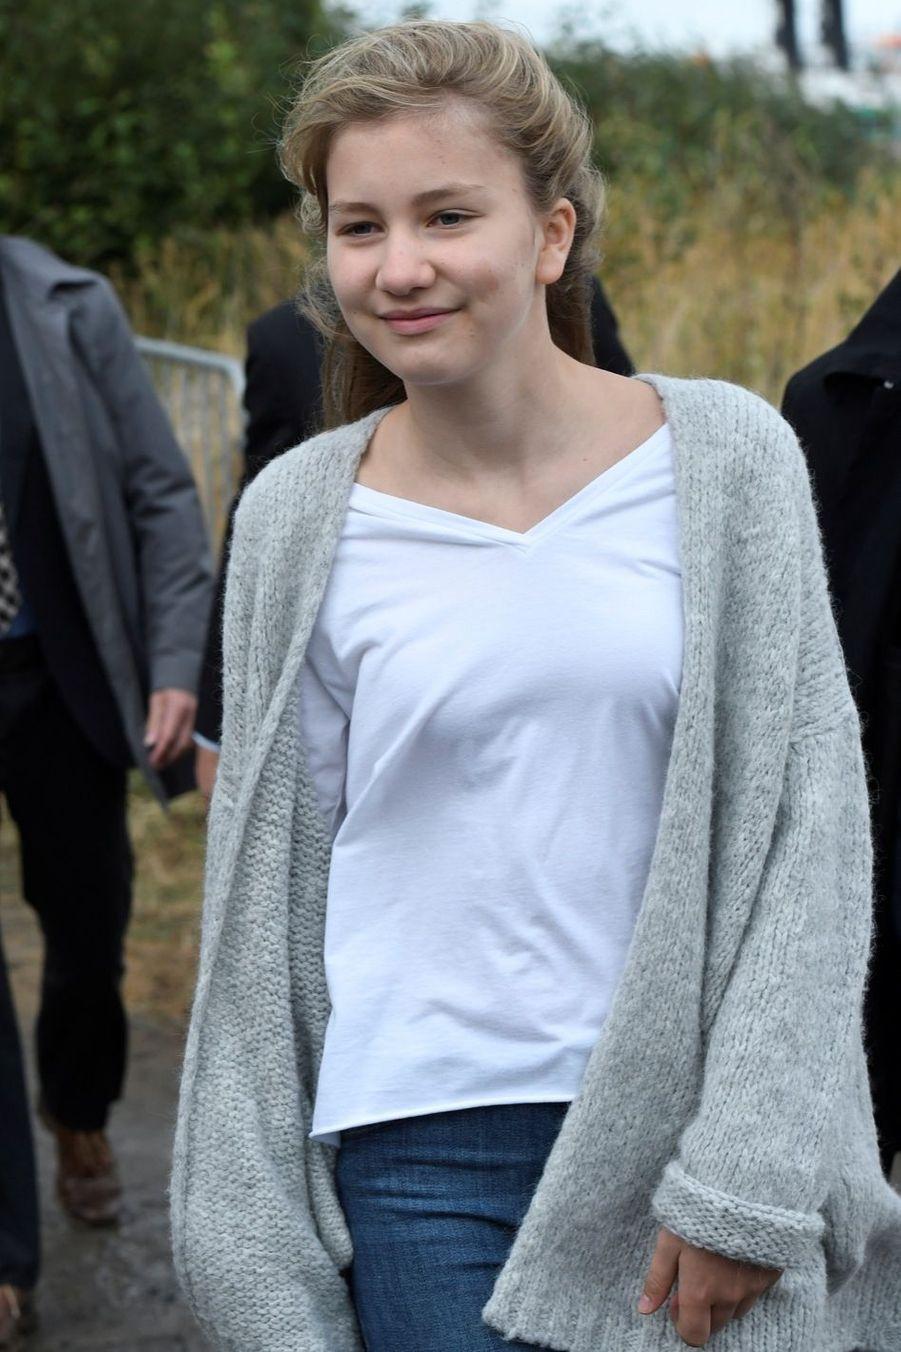 La princesse Elisabeth de Belgique, le 2 octobre 2016